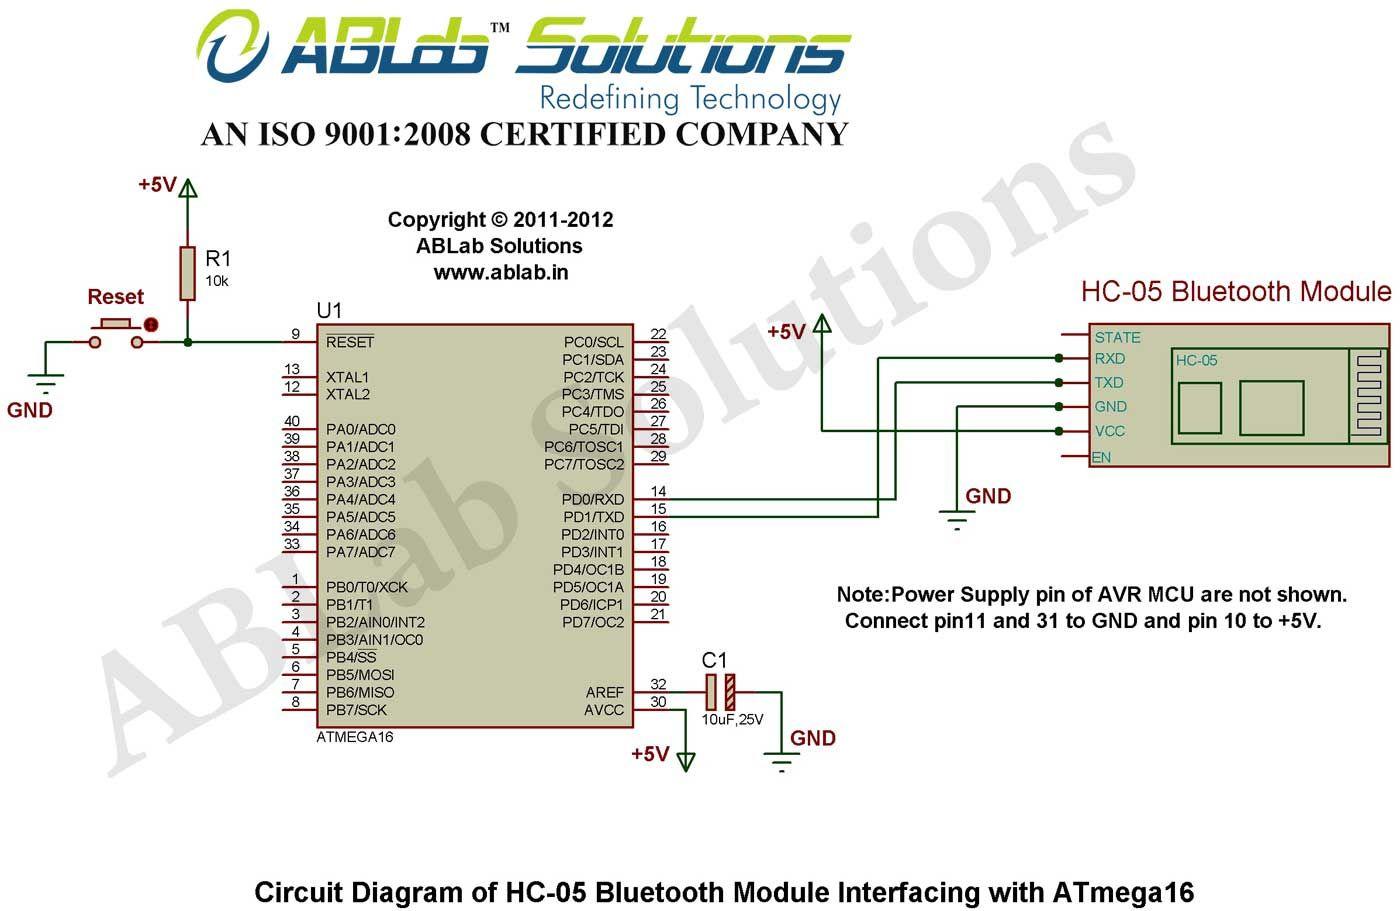 Hc 05 Bluetooth Module Interfacing With Avr Atmega16 Microcontroller Arduino Led Circuit Simulation Using Atmel Studio And Proteus Diagram